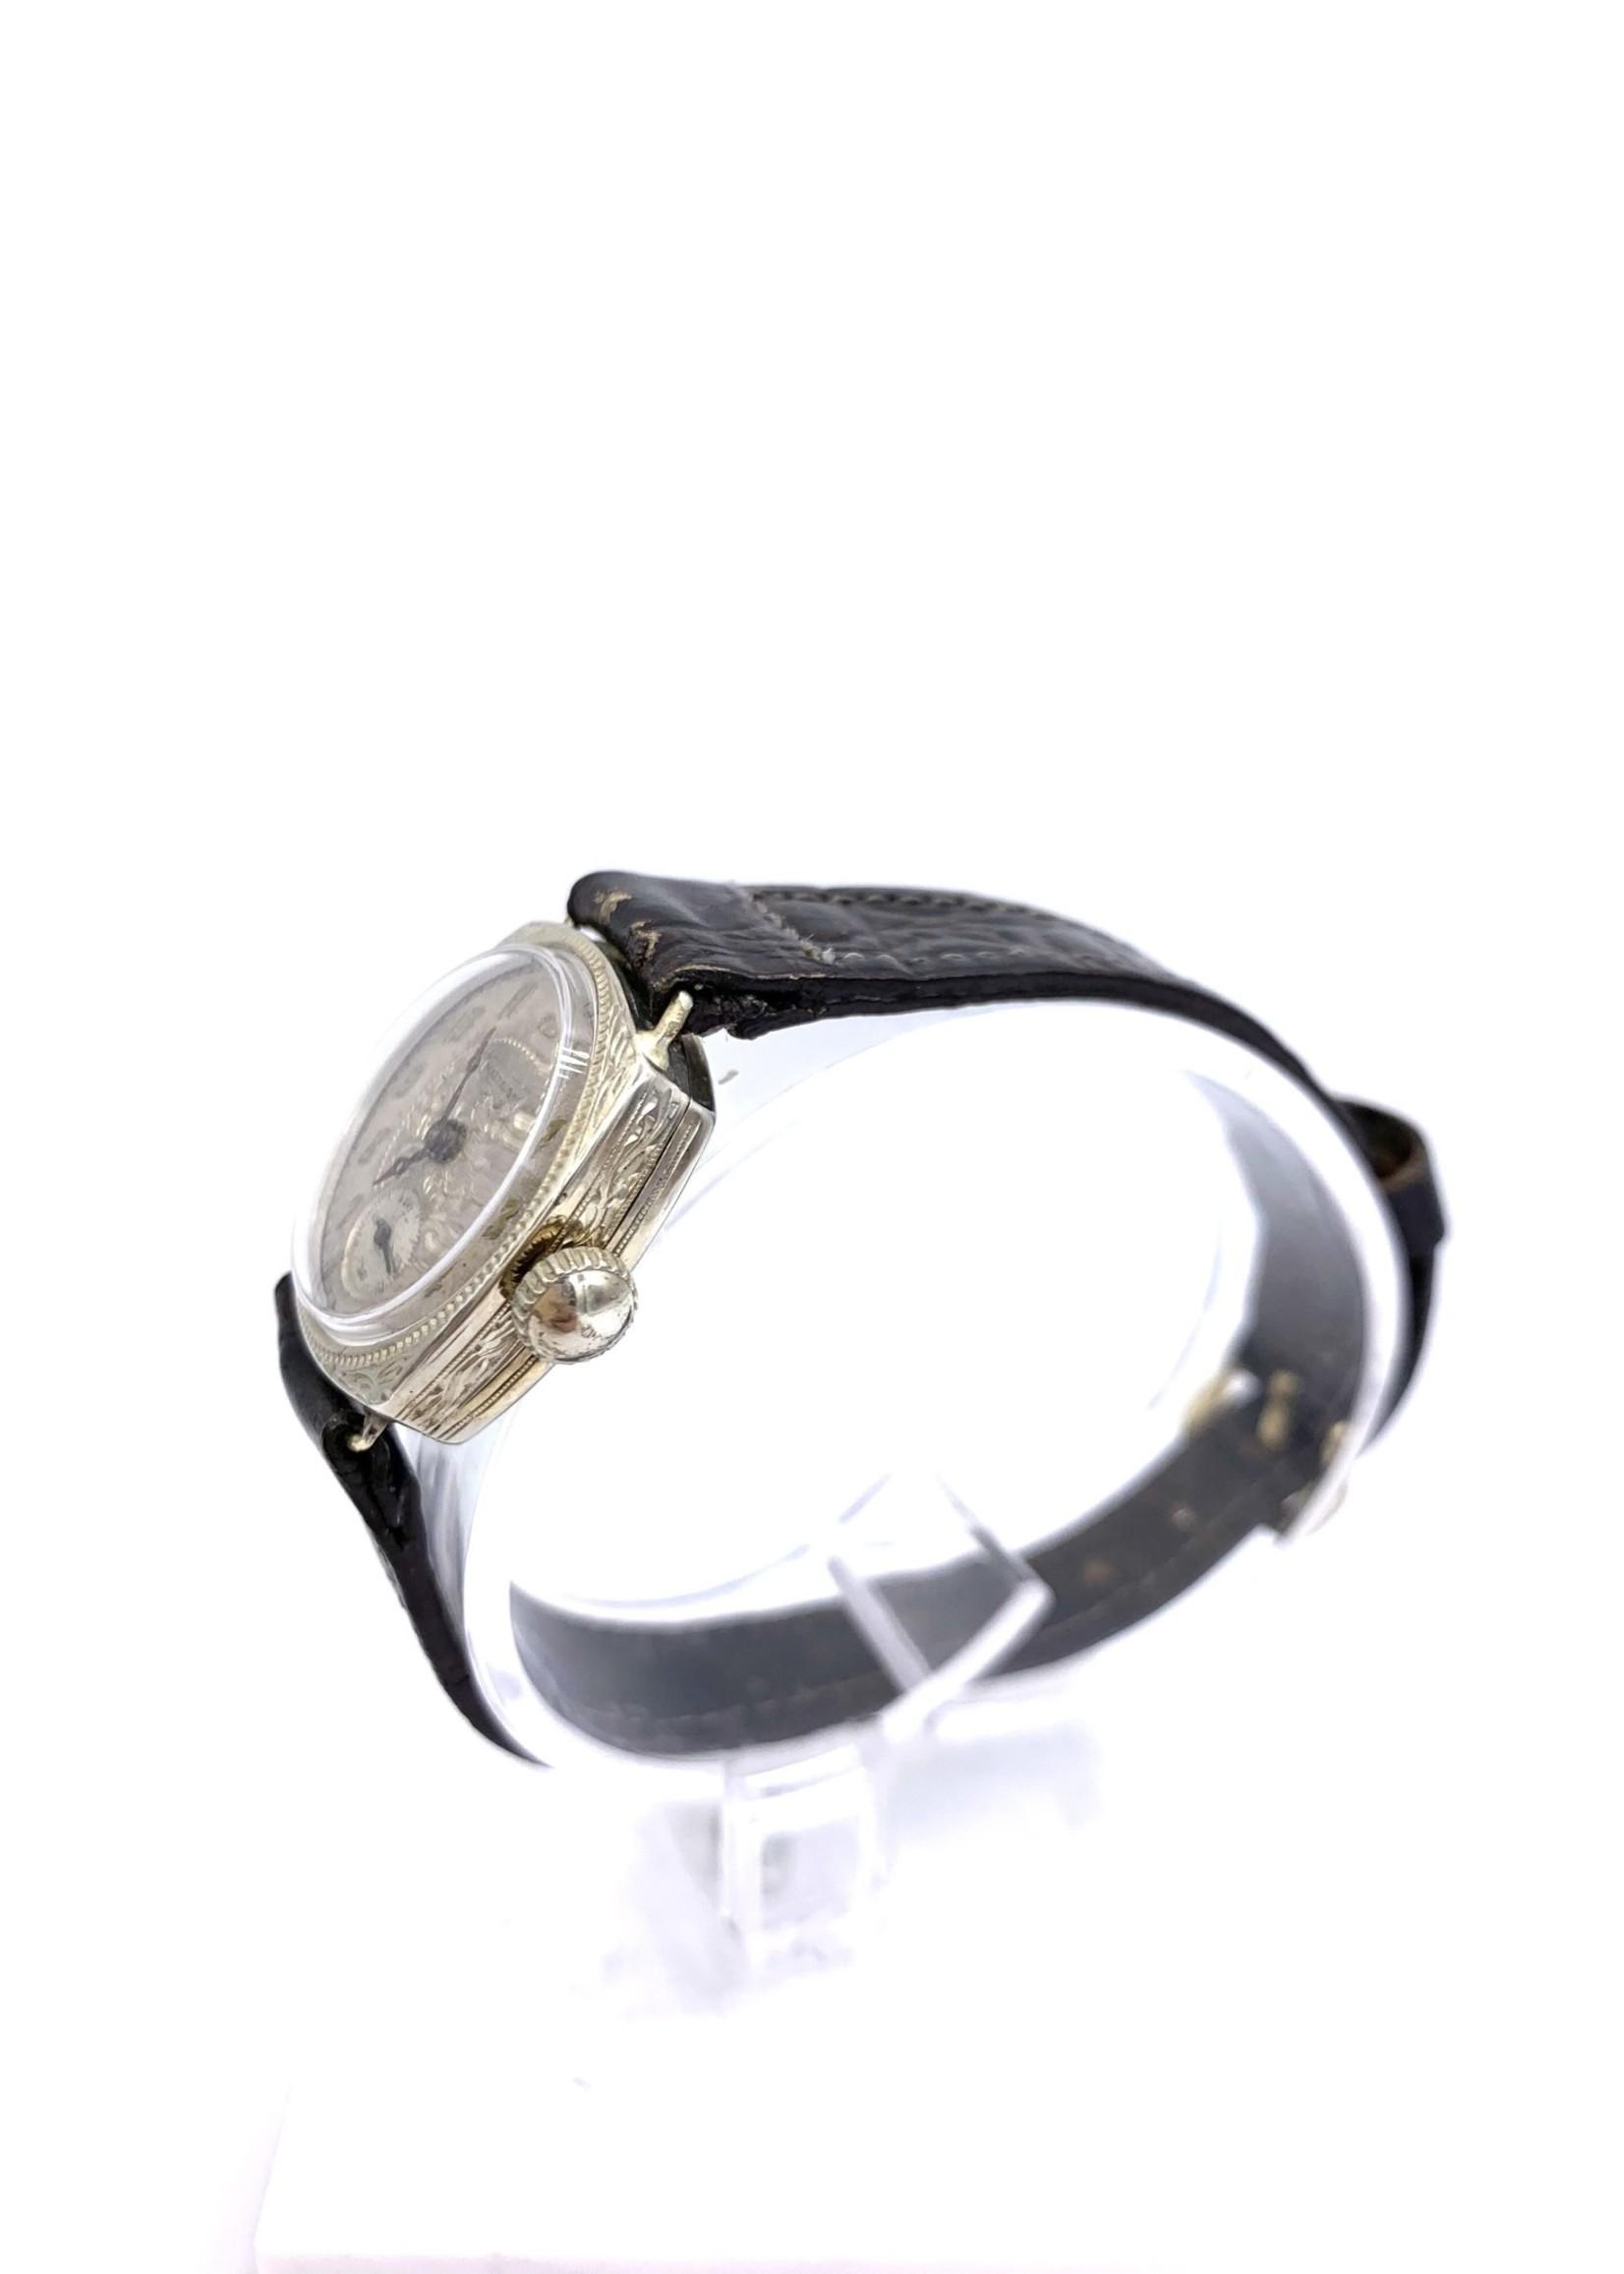 Estate Vintage Waltham Mechanical Movement Watch